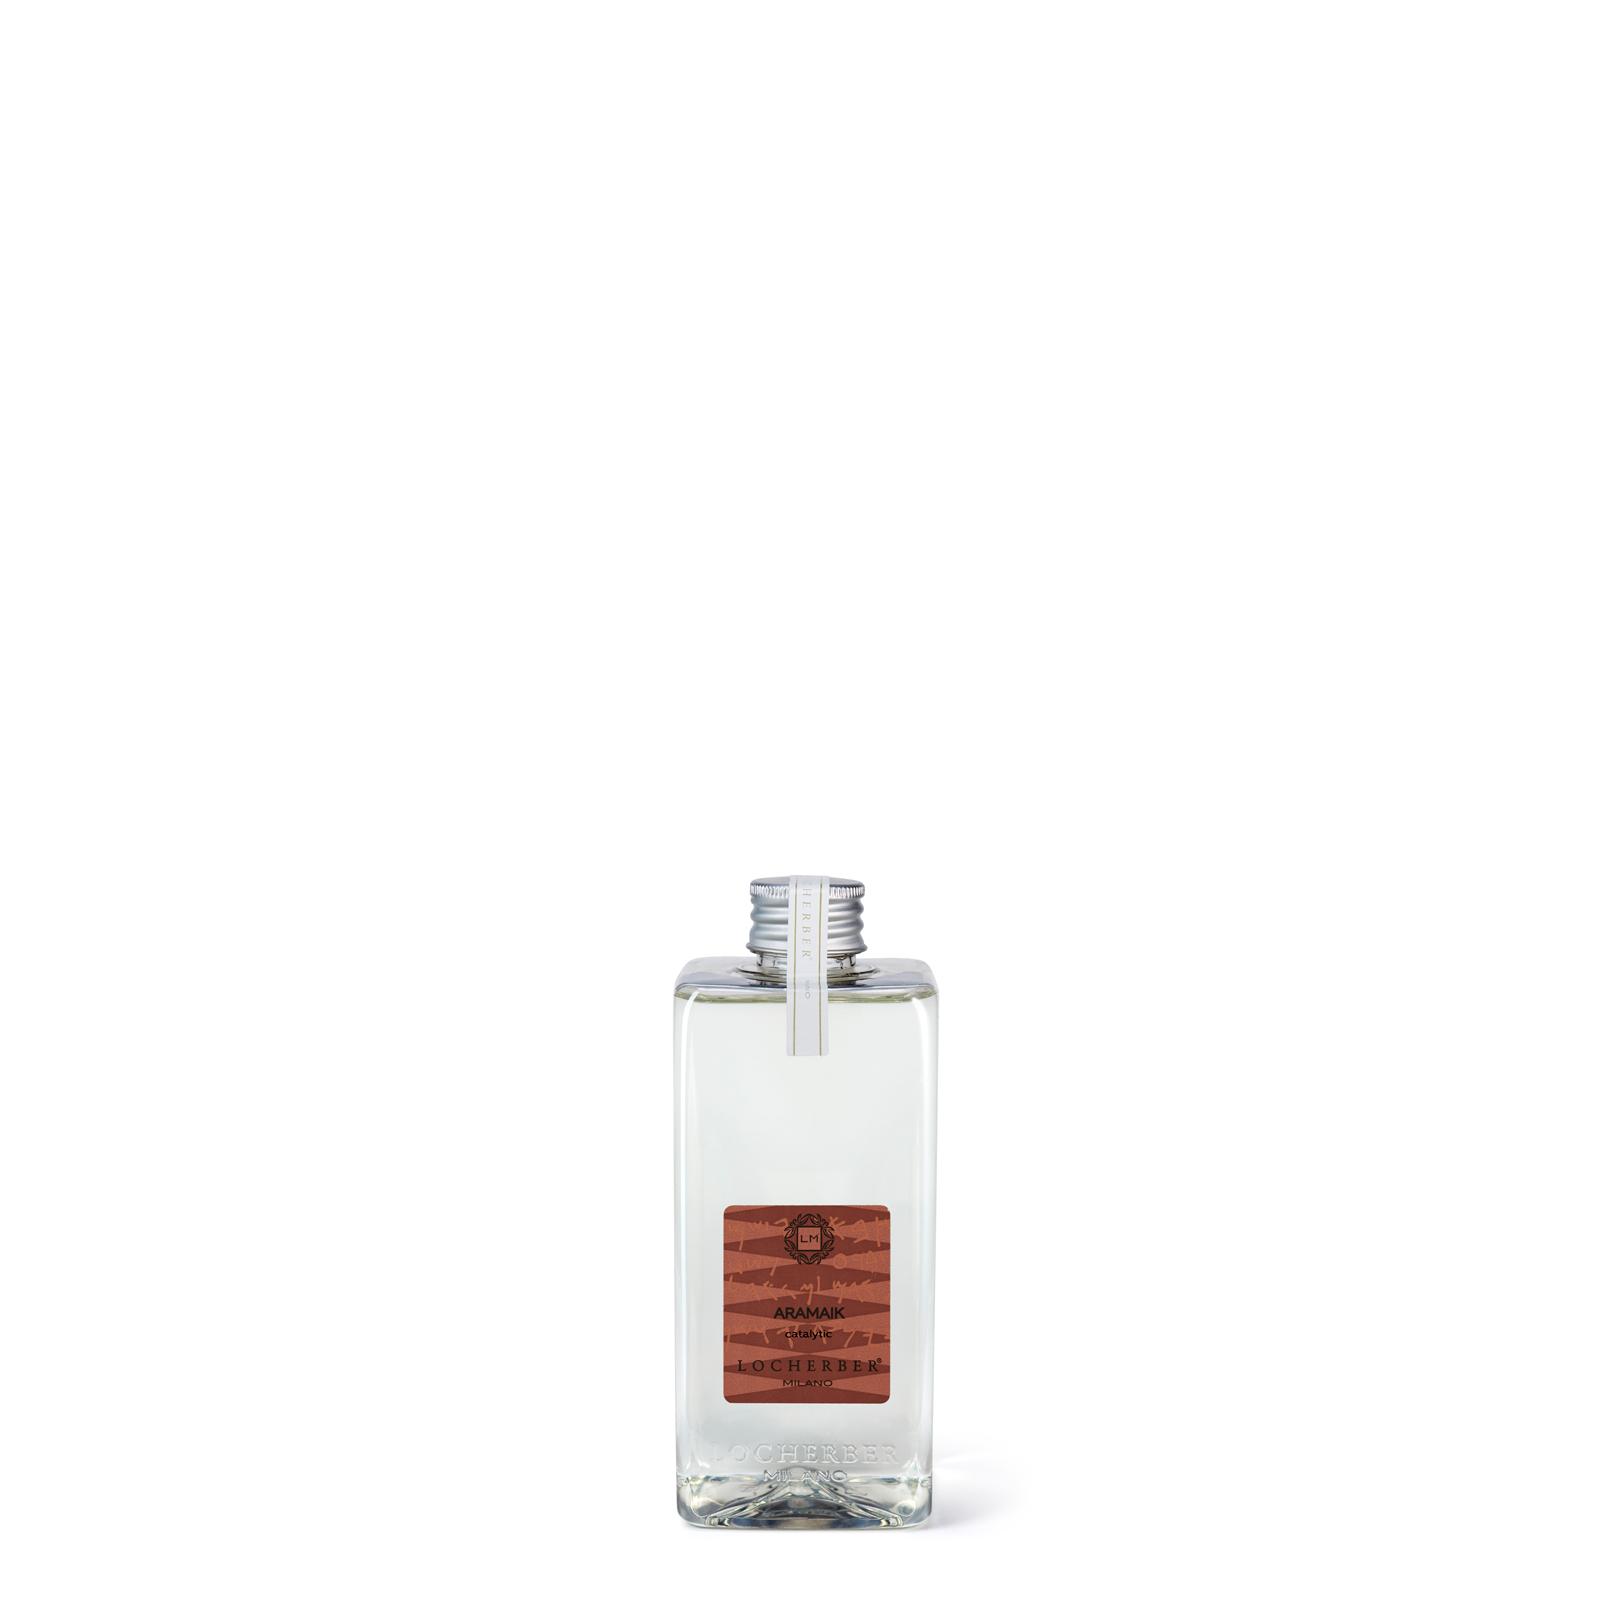 Locherber Milano - Aramaik - Raumduft  500 ml Refill